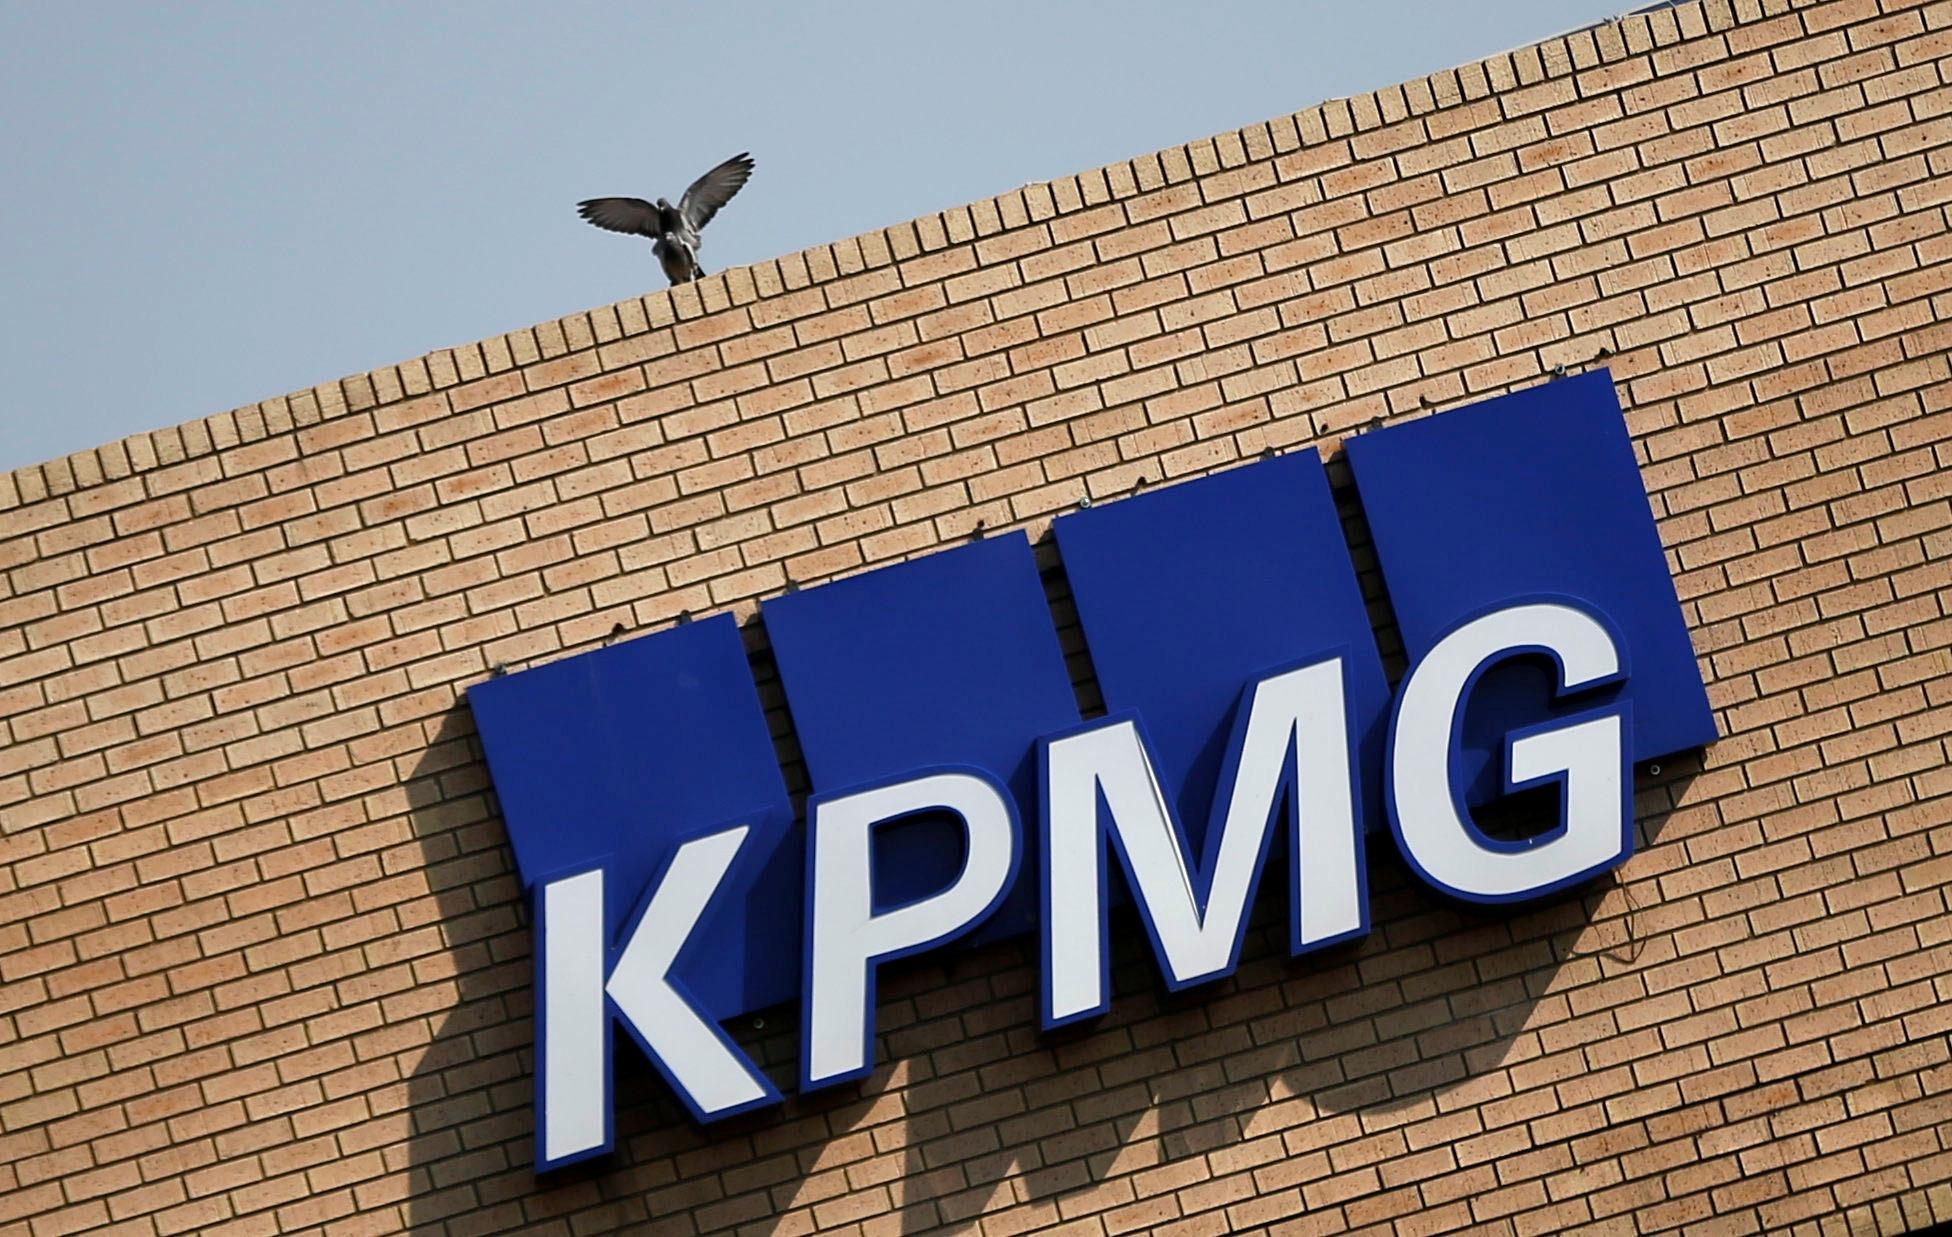 UK audit watchdog proposes record $16 million fine for KPMG